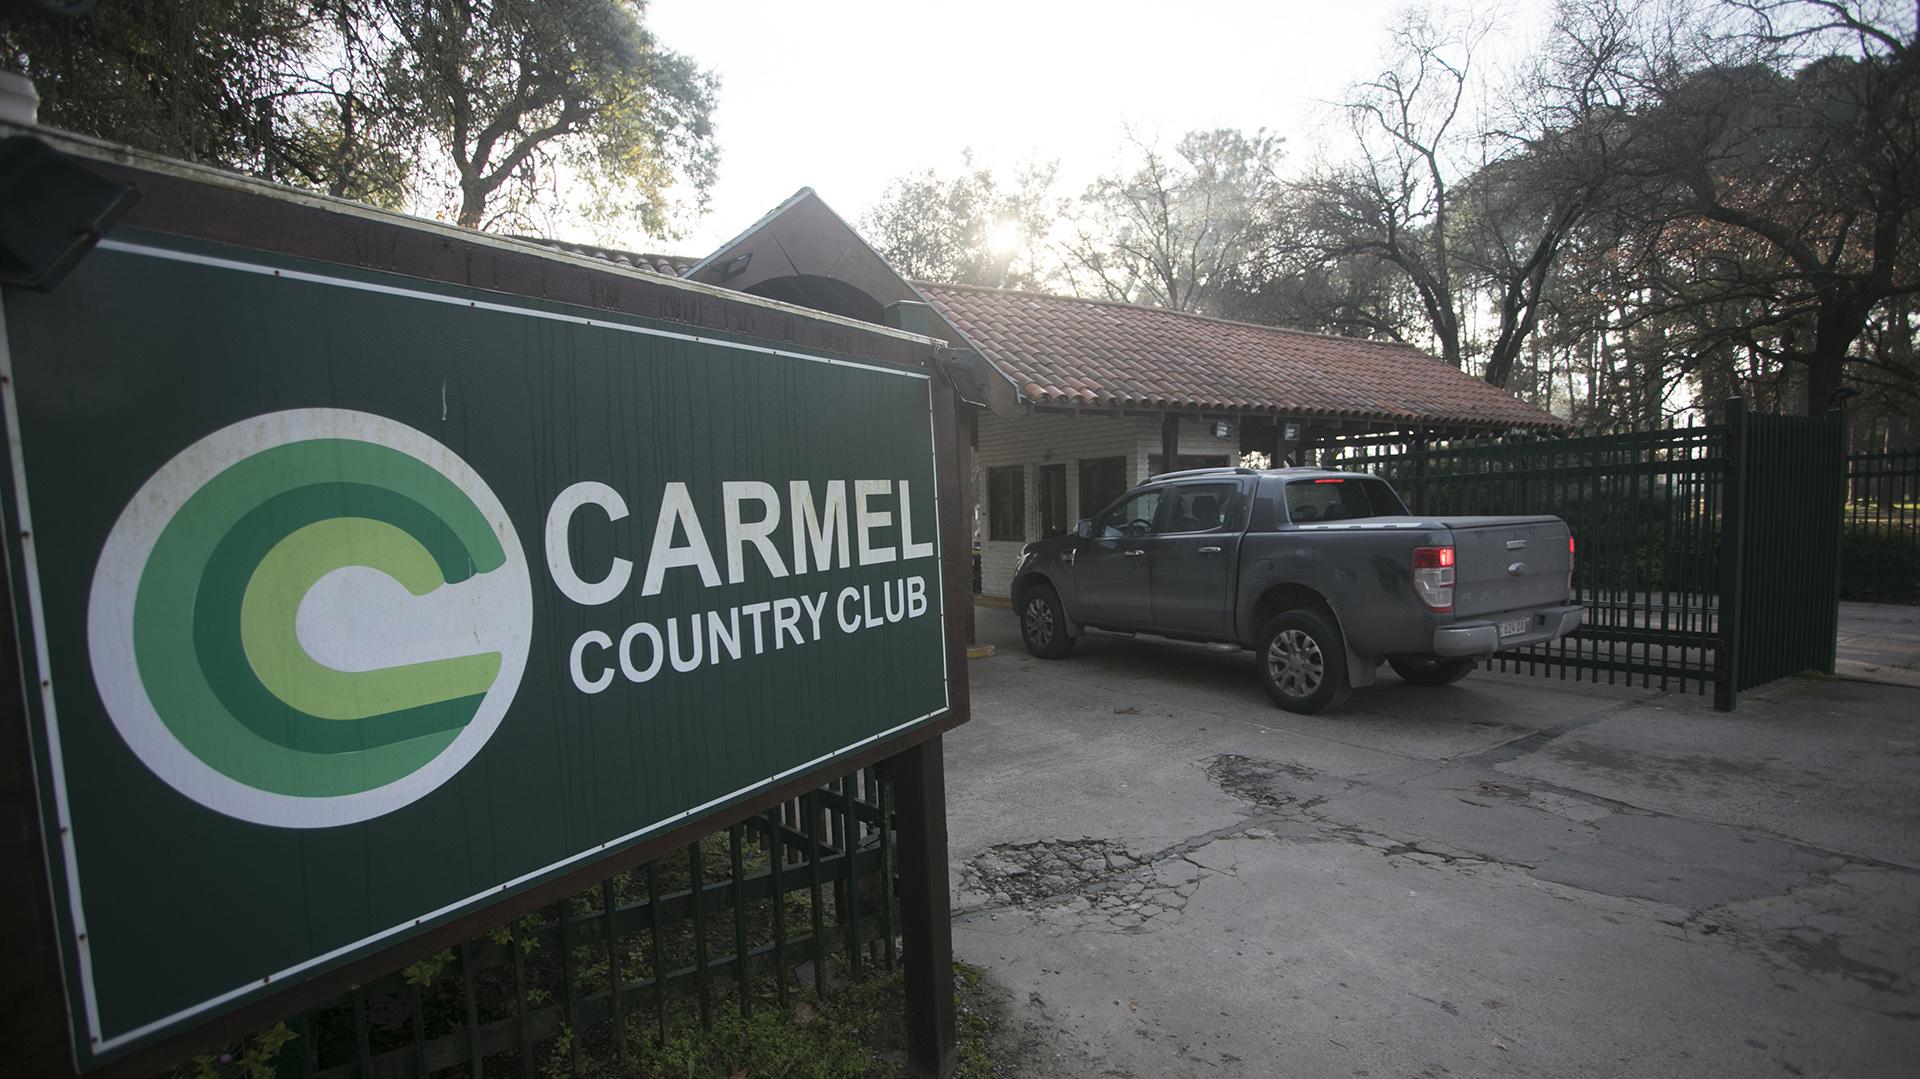 La entrada del country Carmel (foto Alberto Raggio)